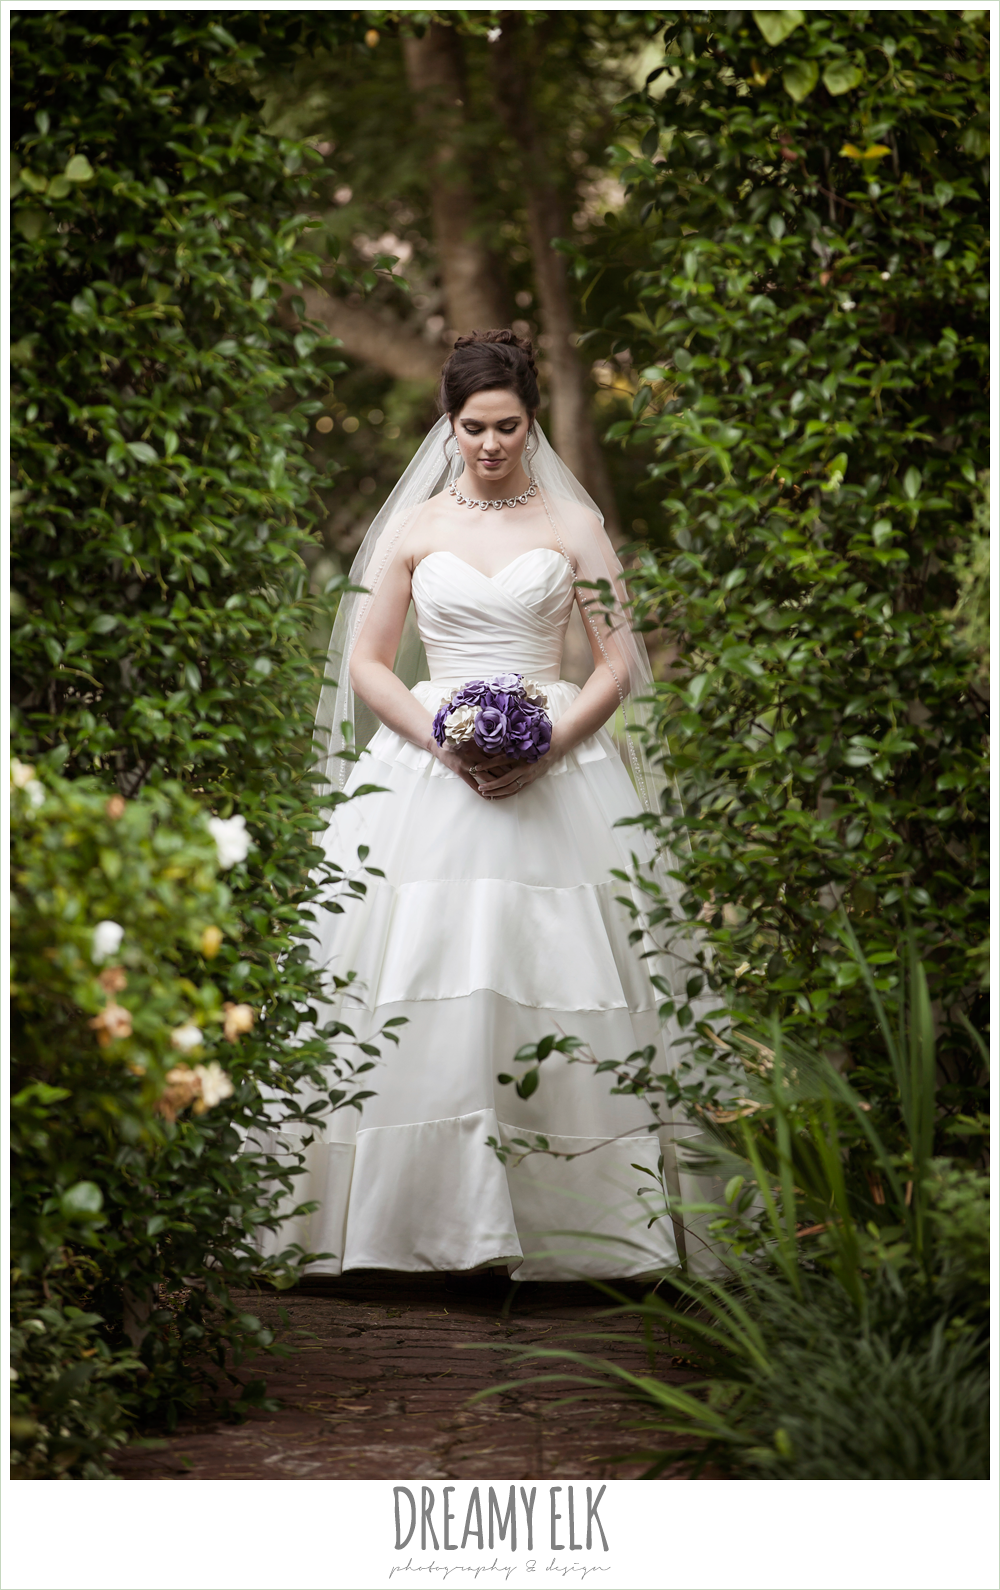 paper flower purple wedding bouquet, ball gown satin wedding dress, outdoor bridal portrait in garden, heather's glen {dreamy elk photography and design}